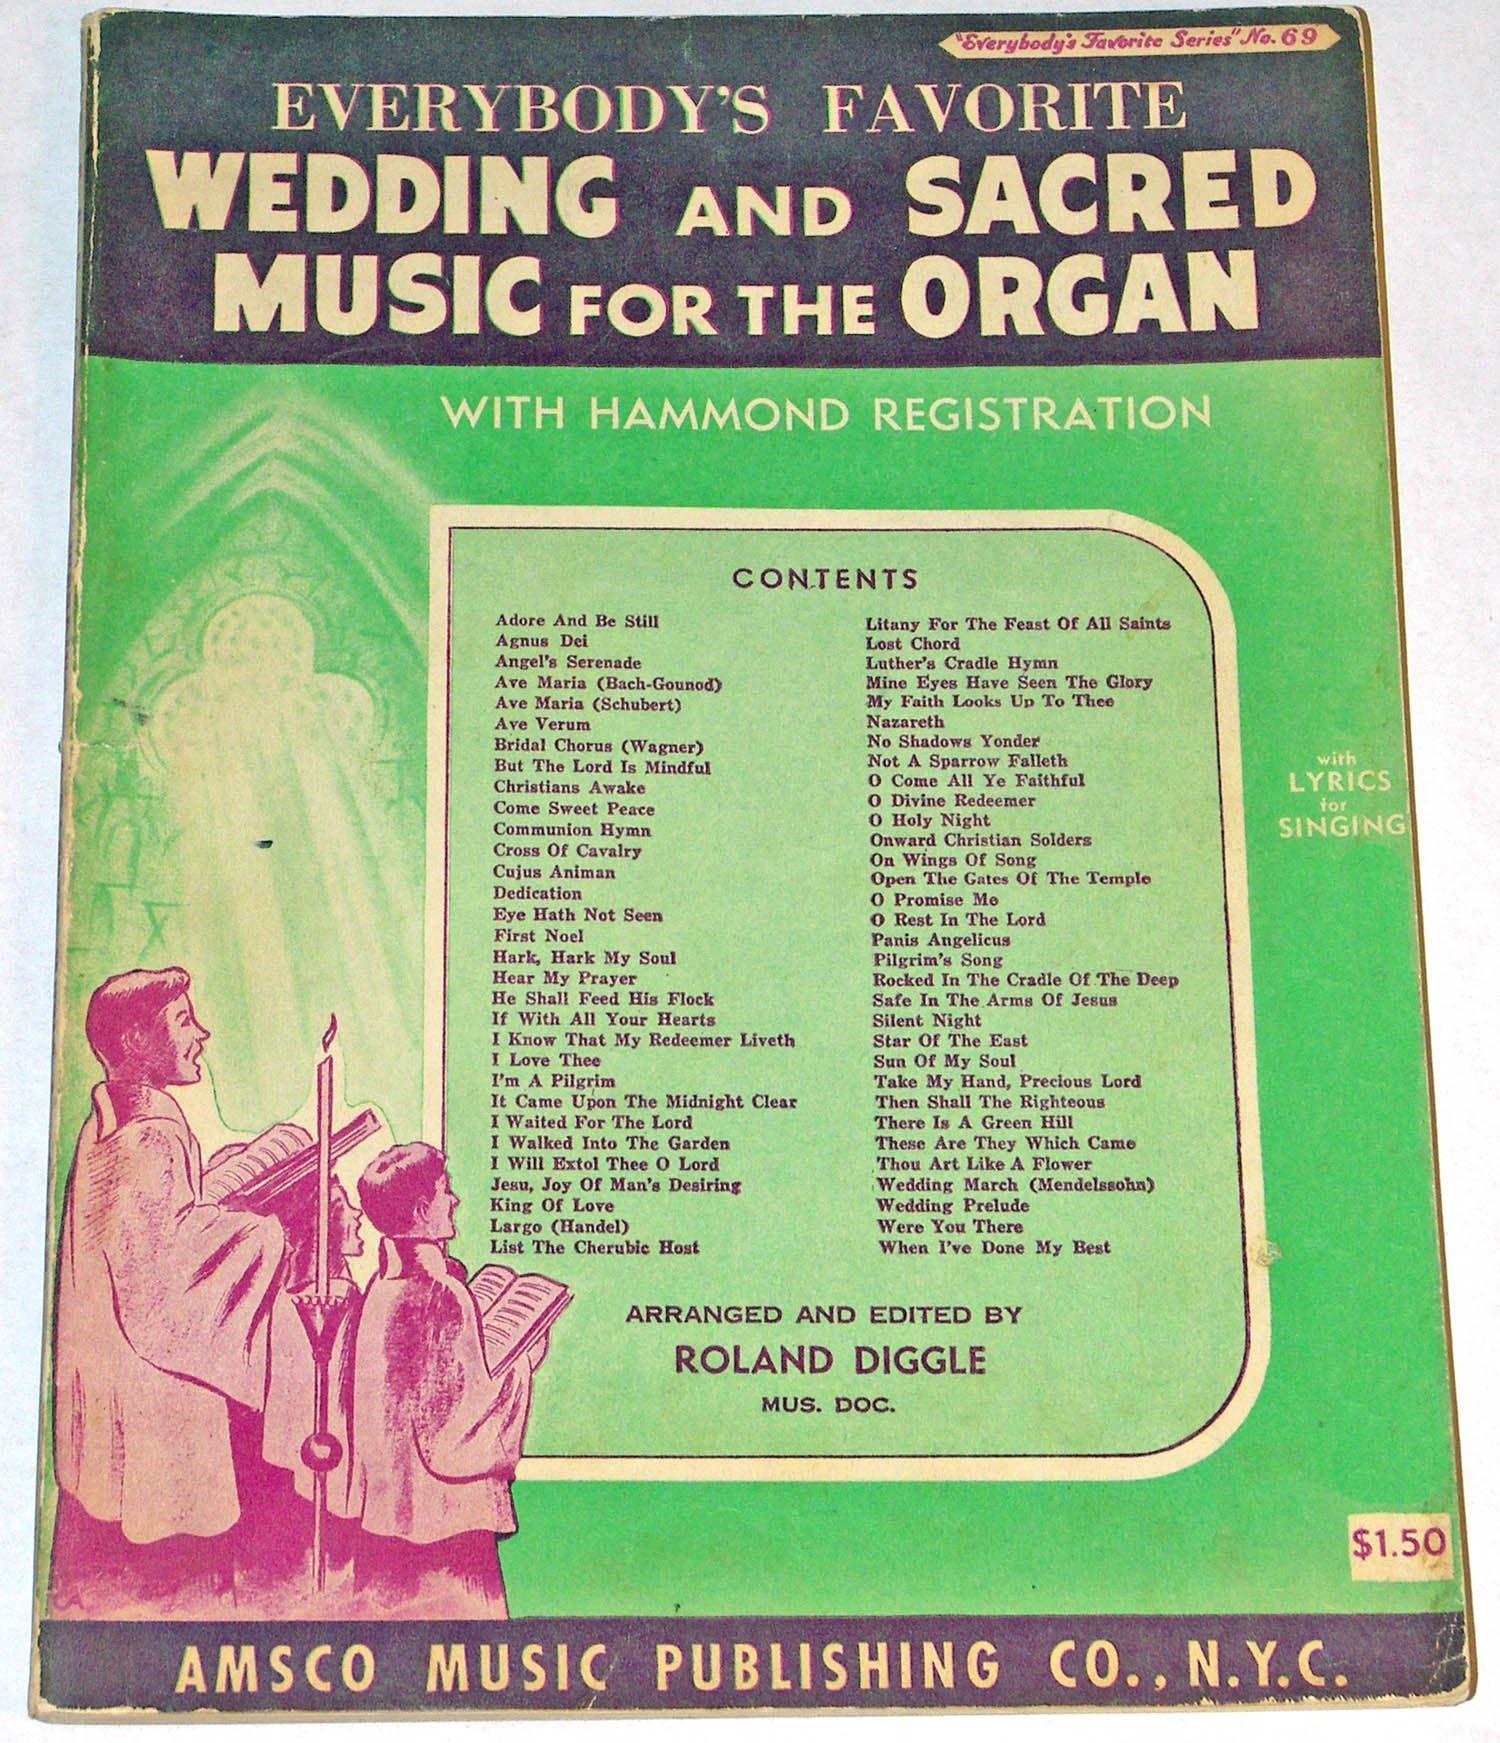 Everybodys Favorite Wedding And Sacred Music For Organ With Lyrics Singing Hammond Registration Roland Diggle Amazon Books